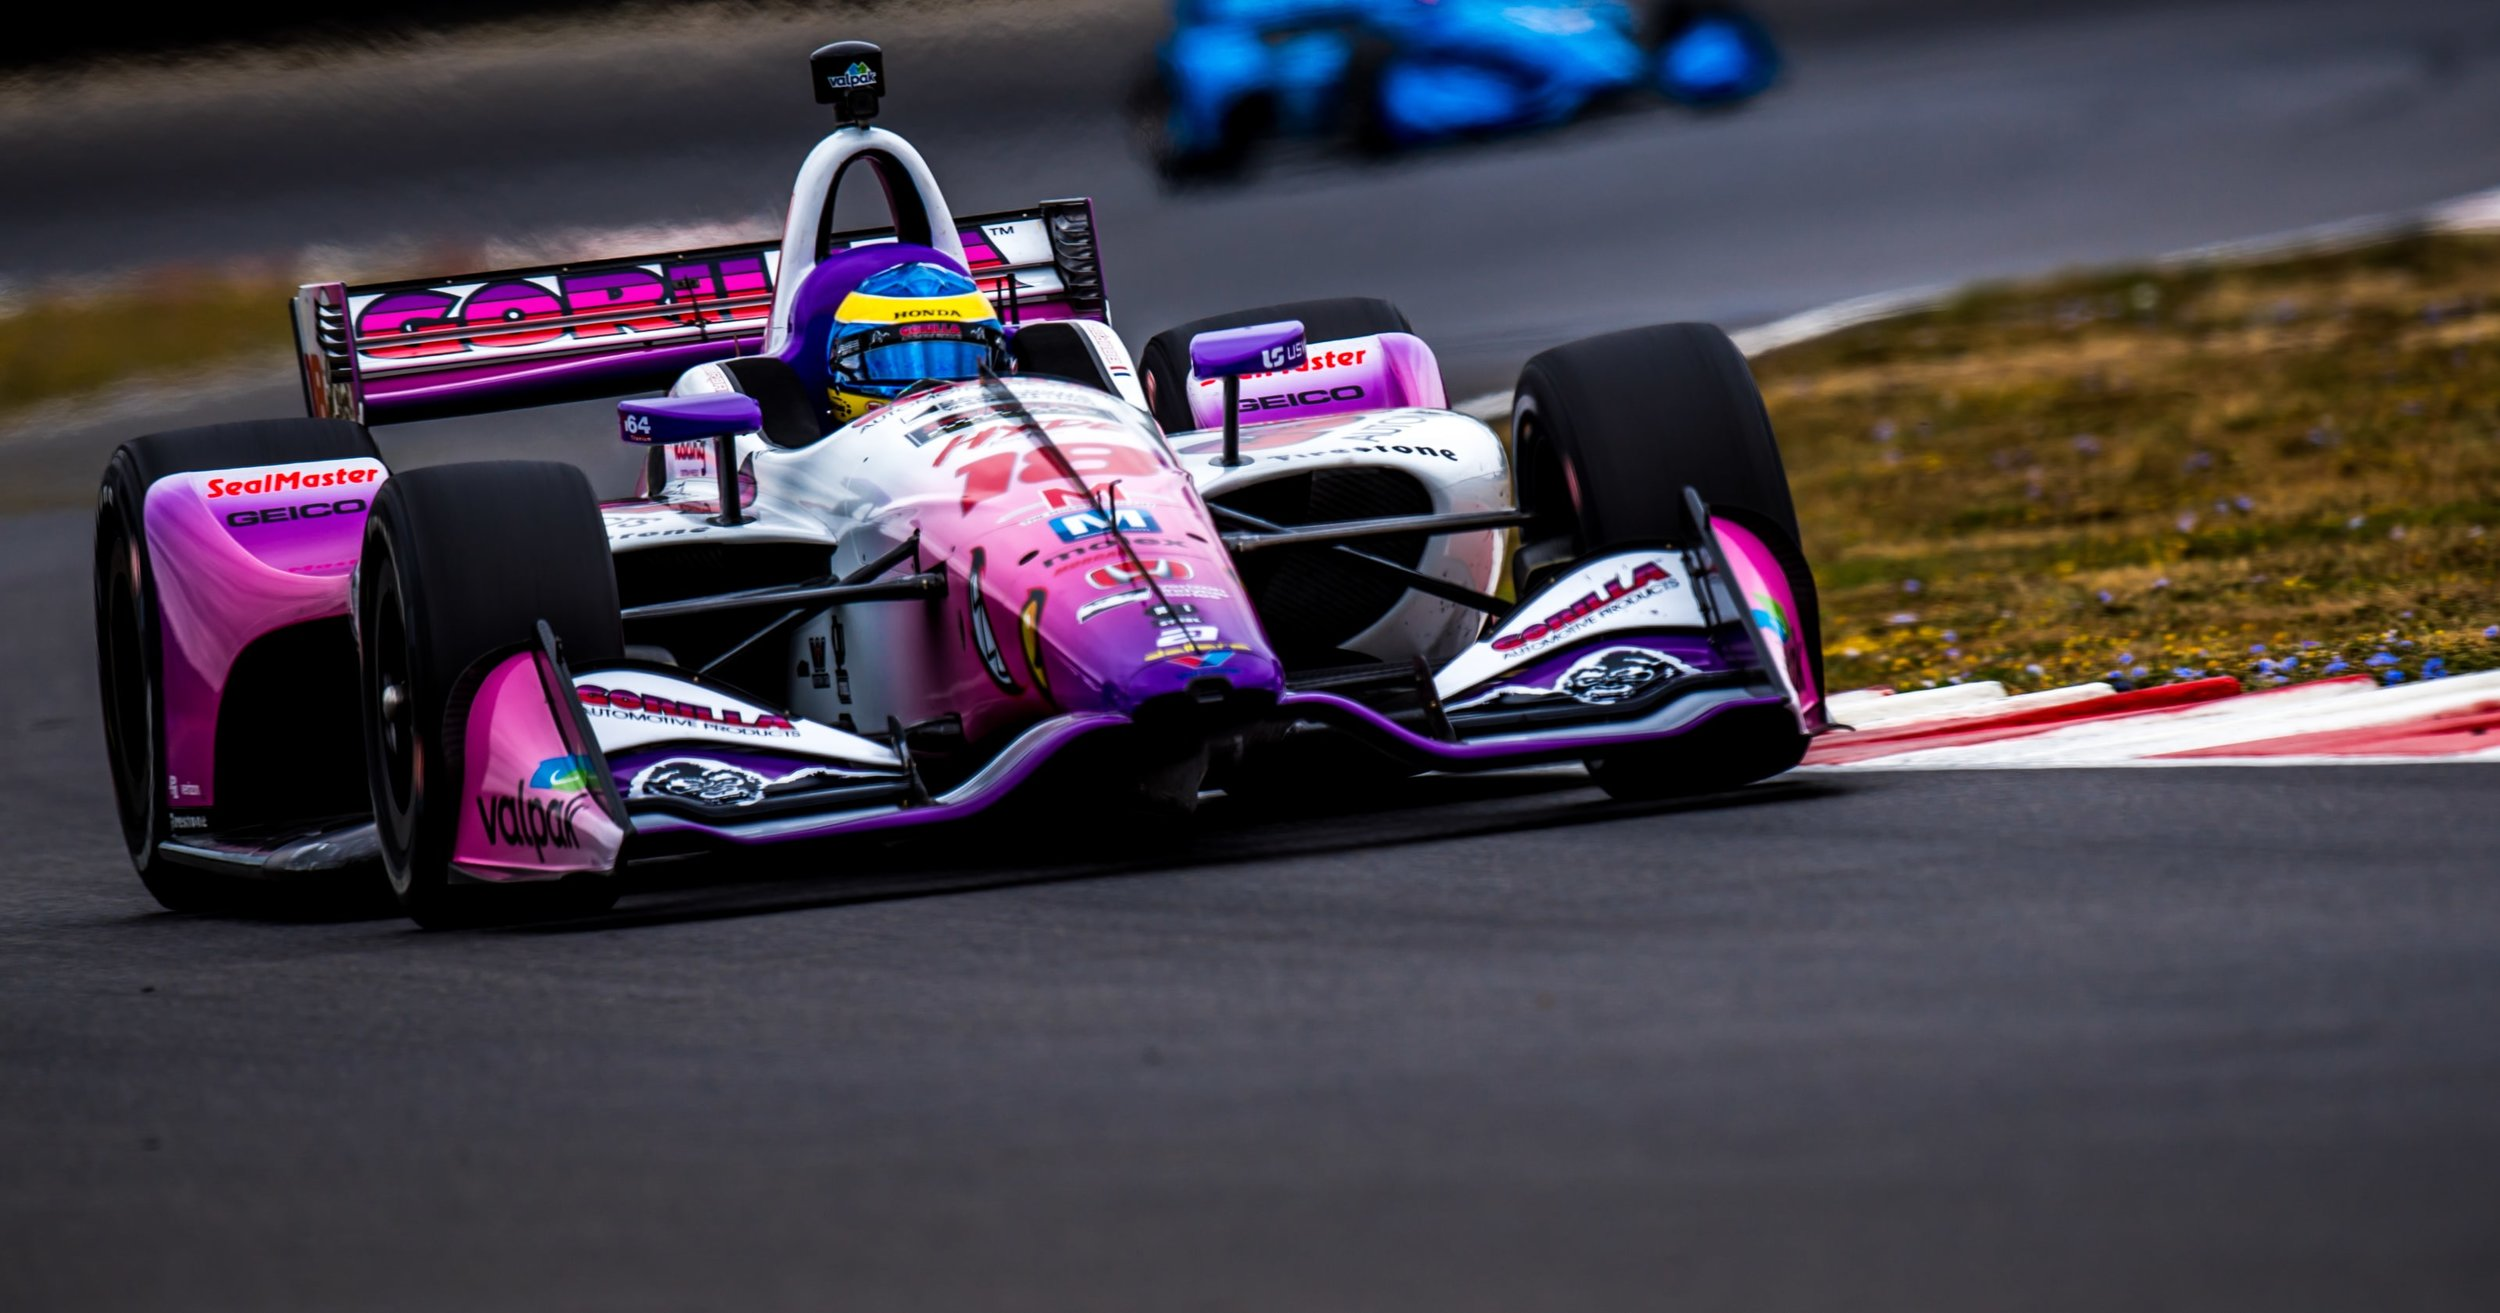 Bourdais-practice-for-2018-Grand-Prix-of-Portland-IndyCar-race.jpg